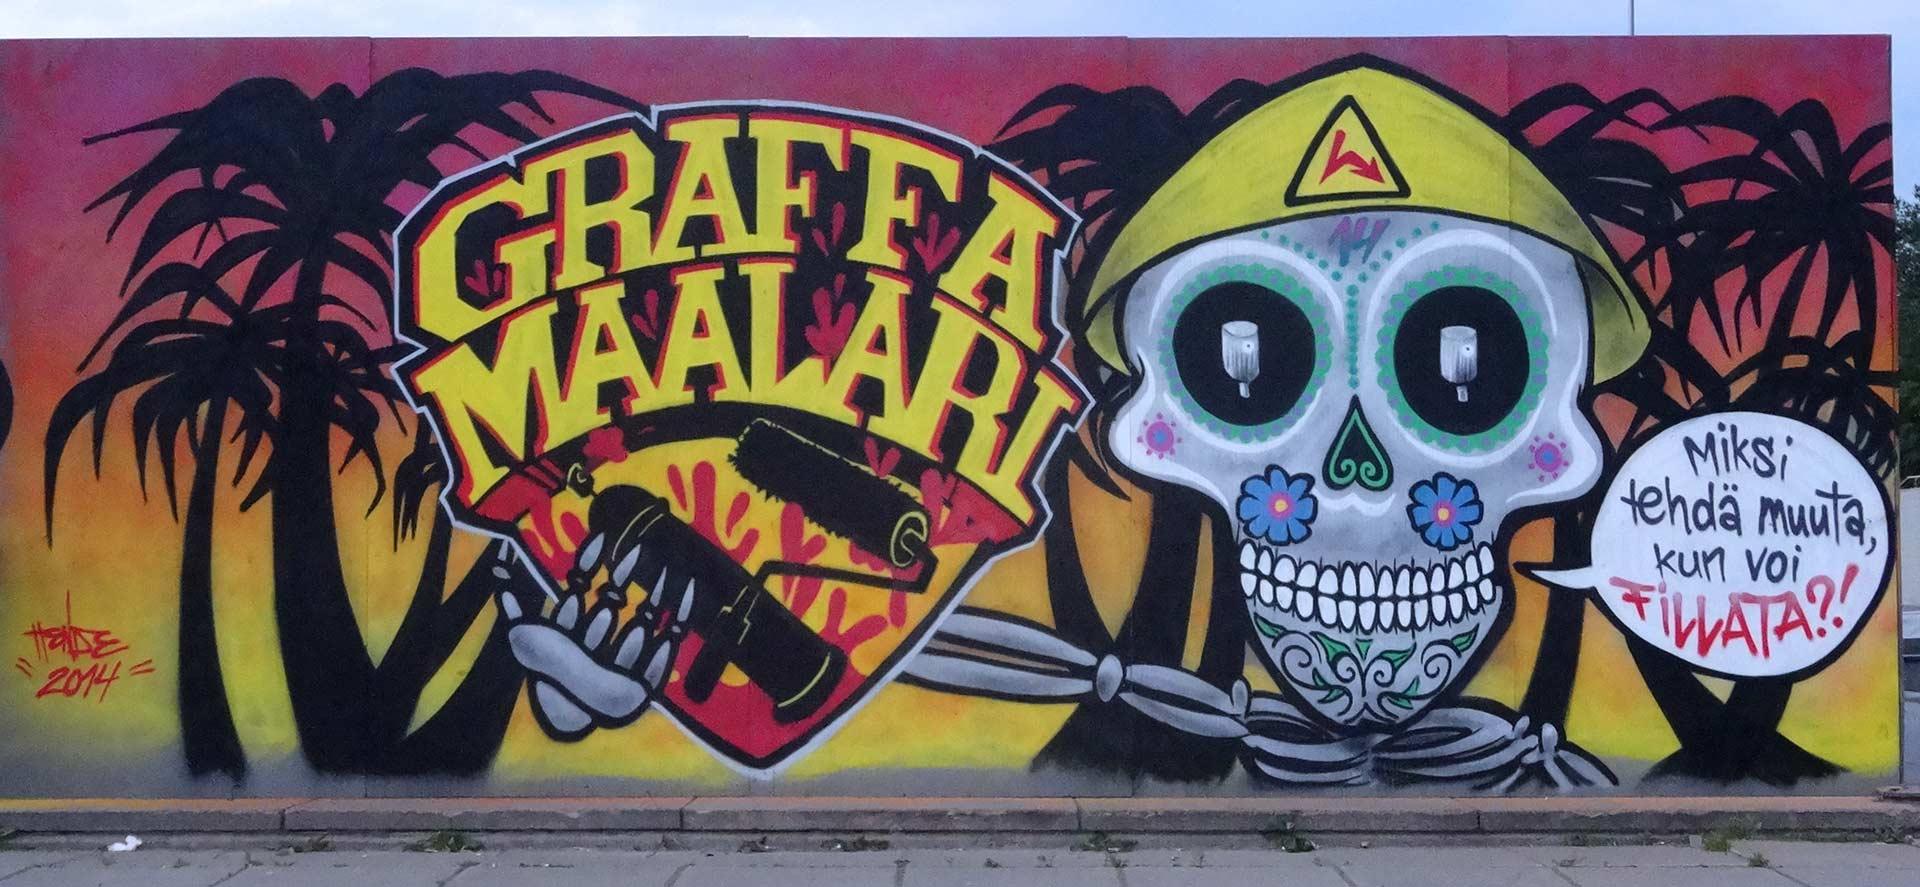 graffamaalari